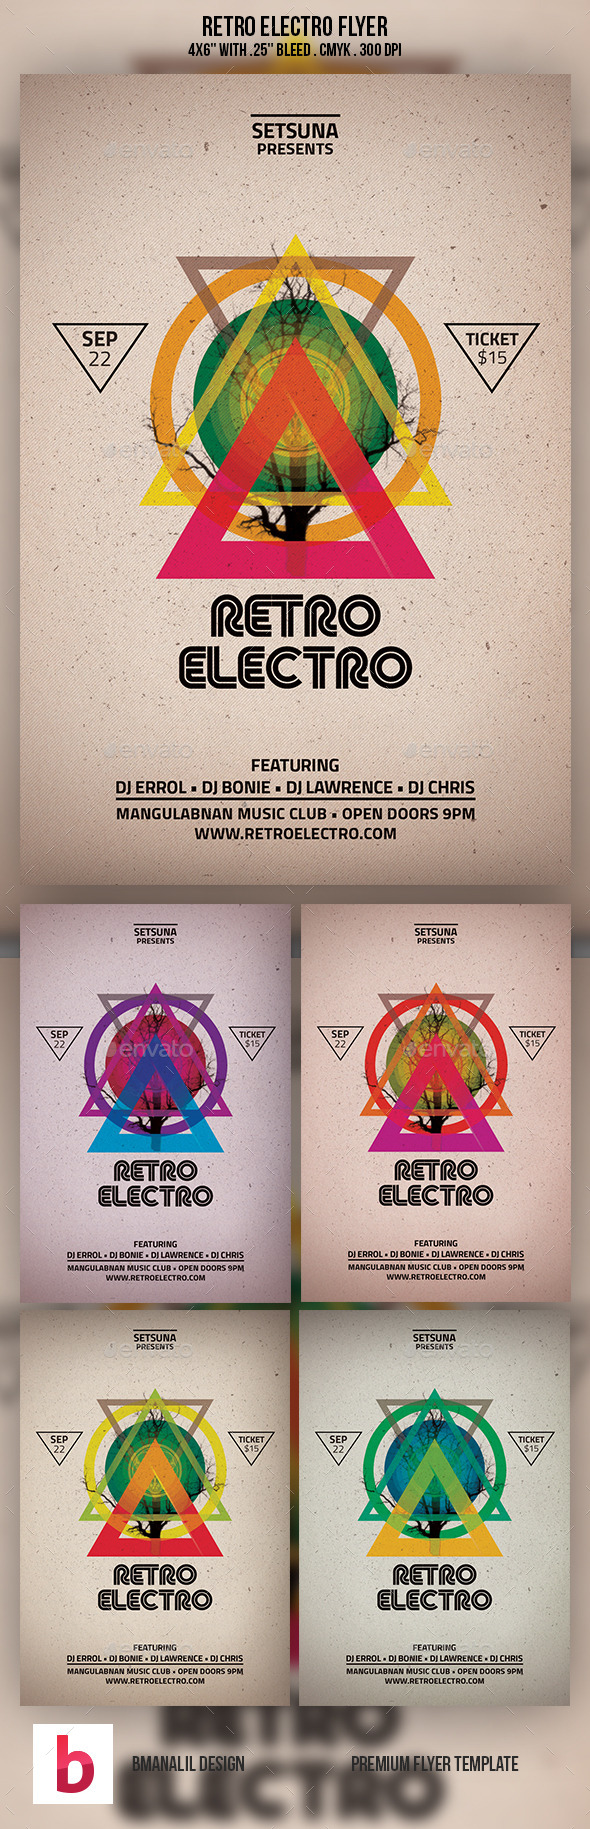 Retro Electro Flyer